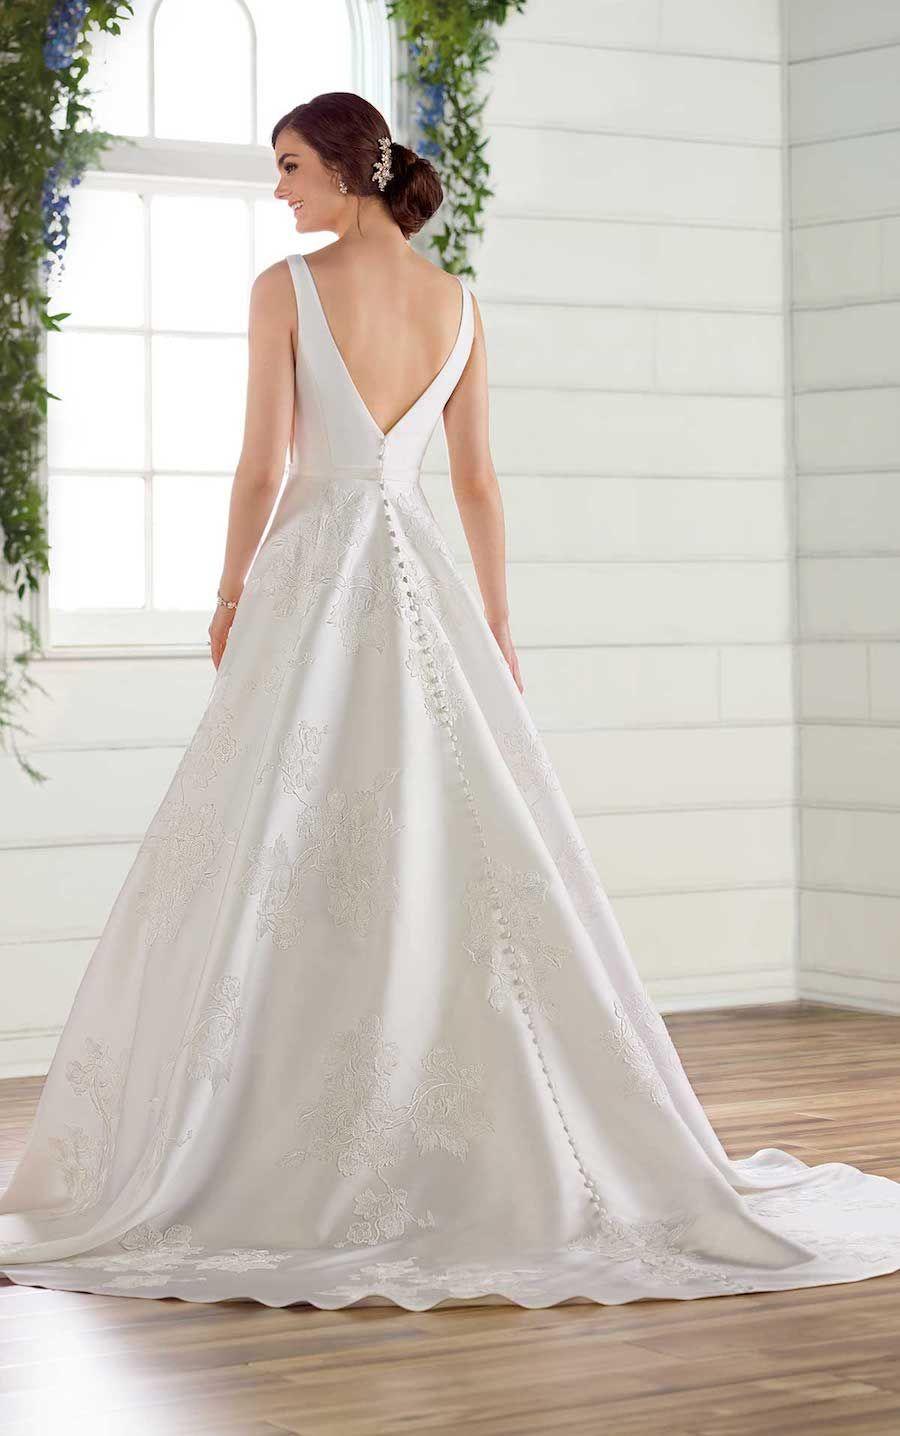 Essense of Australia's Classic Chic Spring 2019 Wedding